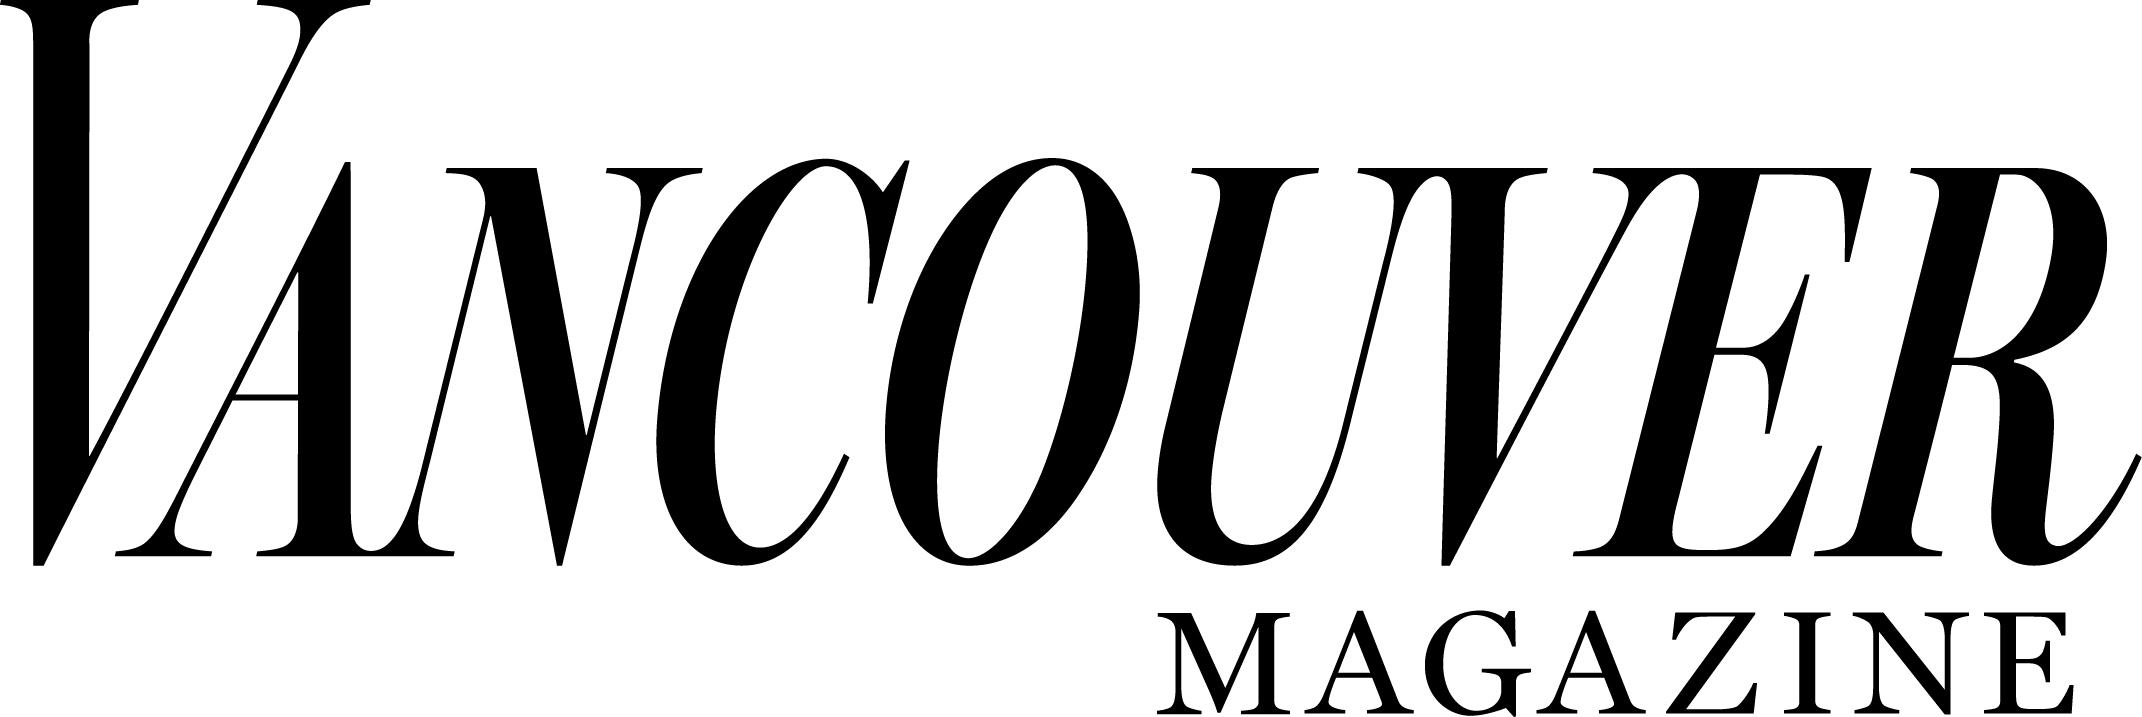 Vancovuer Magazine Logo